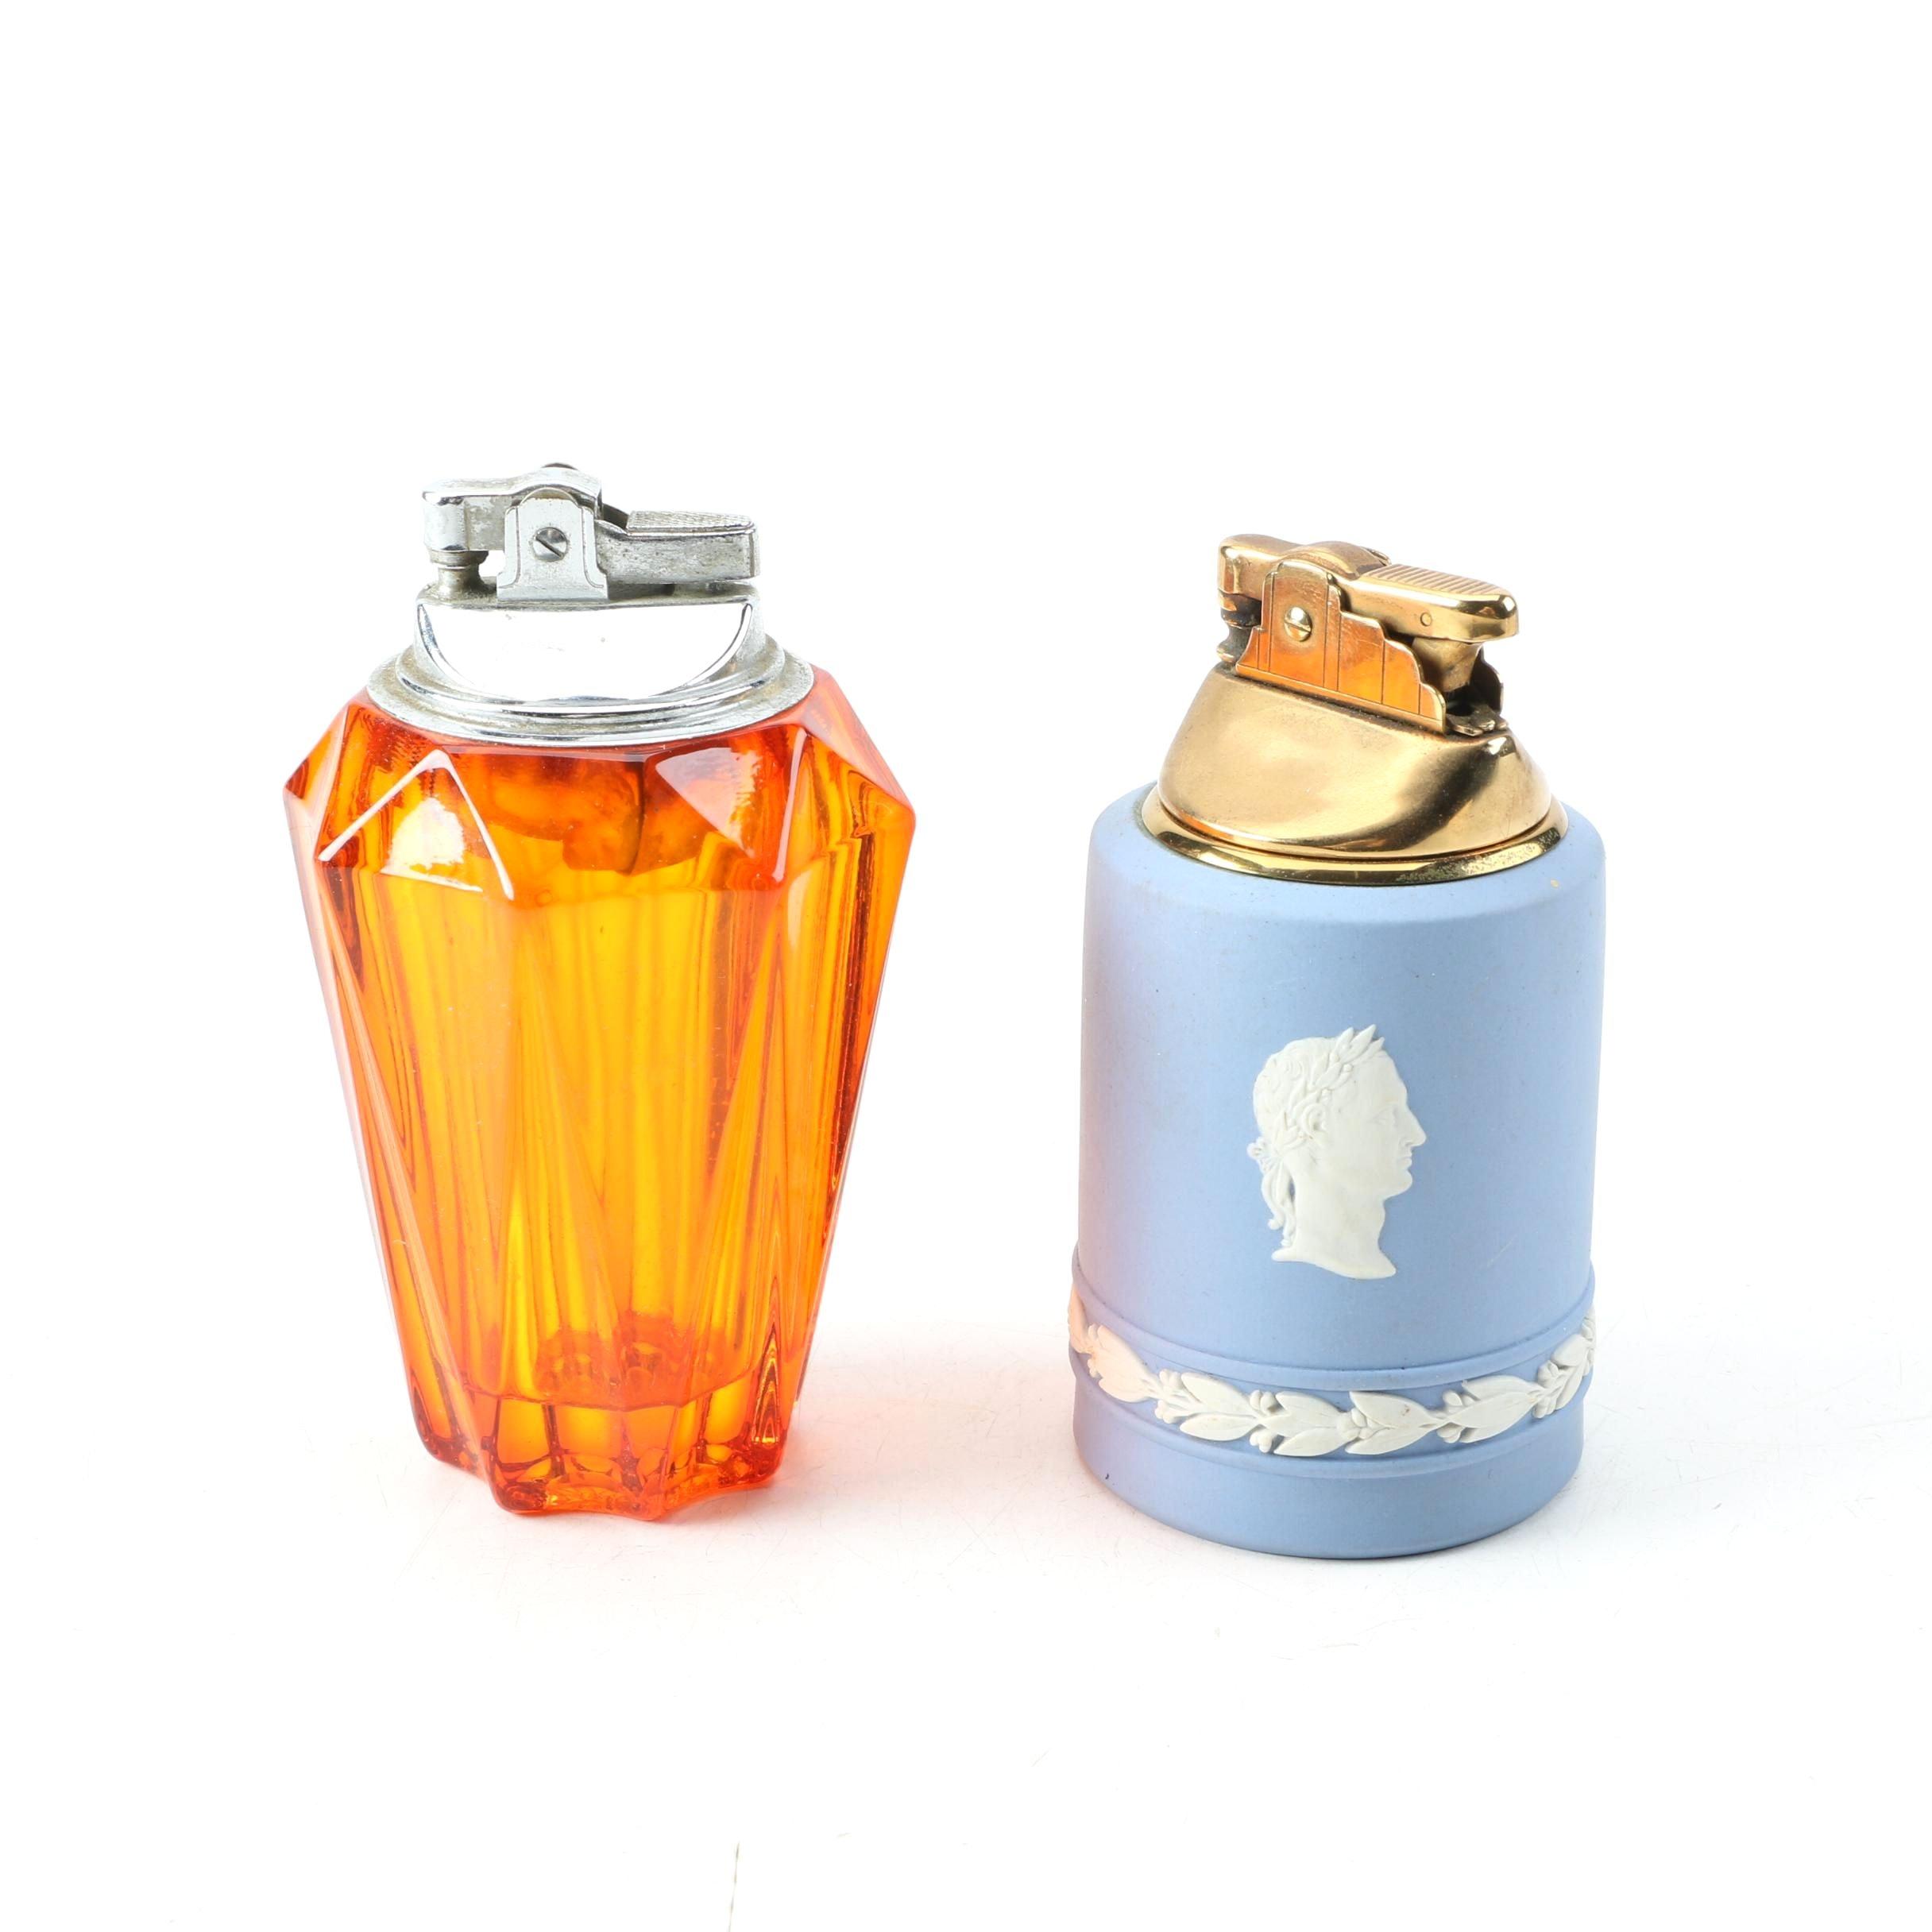 Vintage Wedgwood Jasperware and Amber Glass Table Lighters